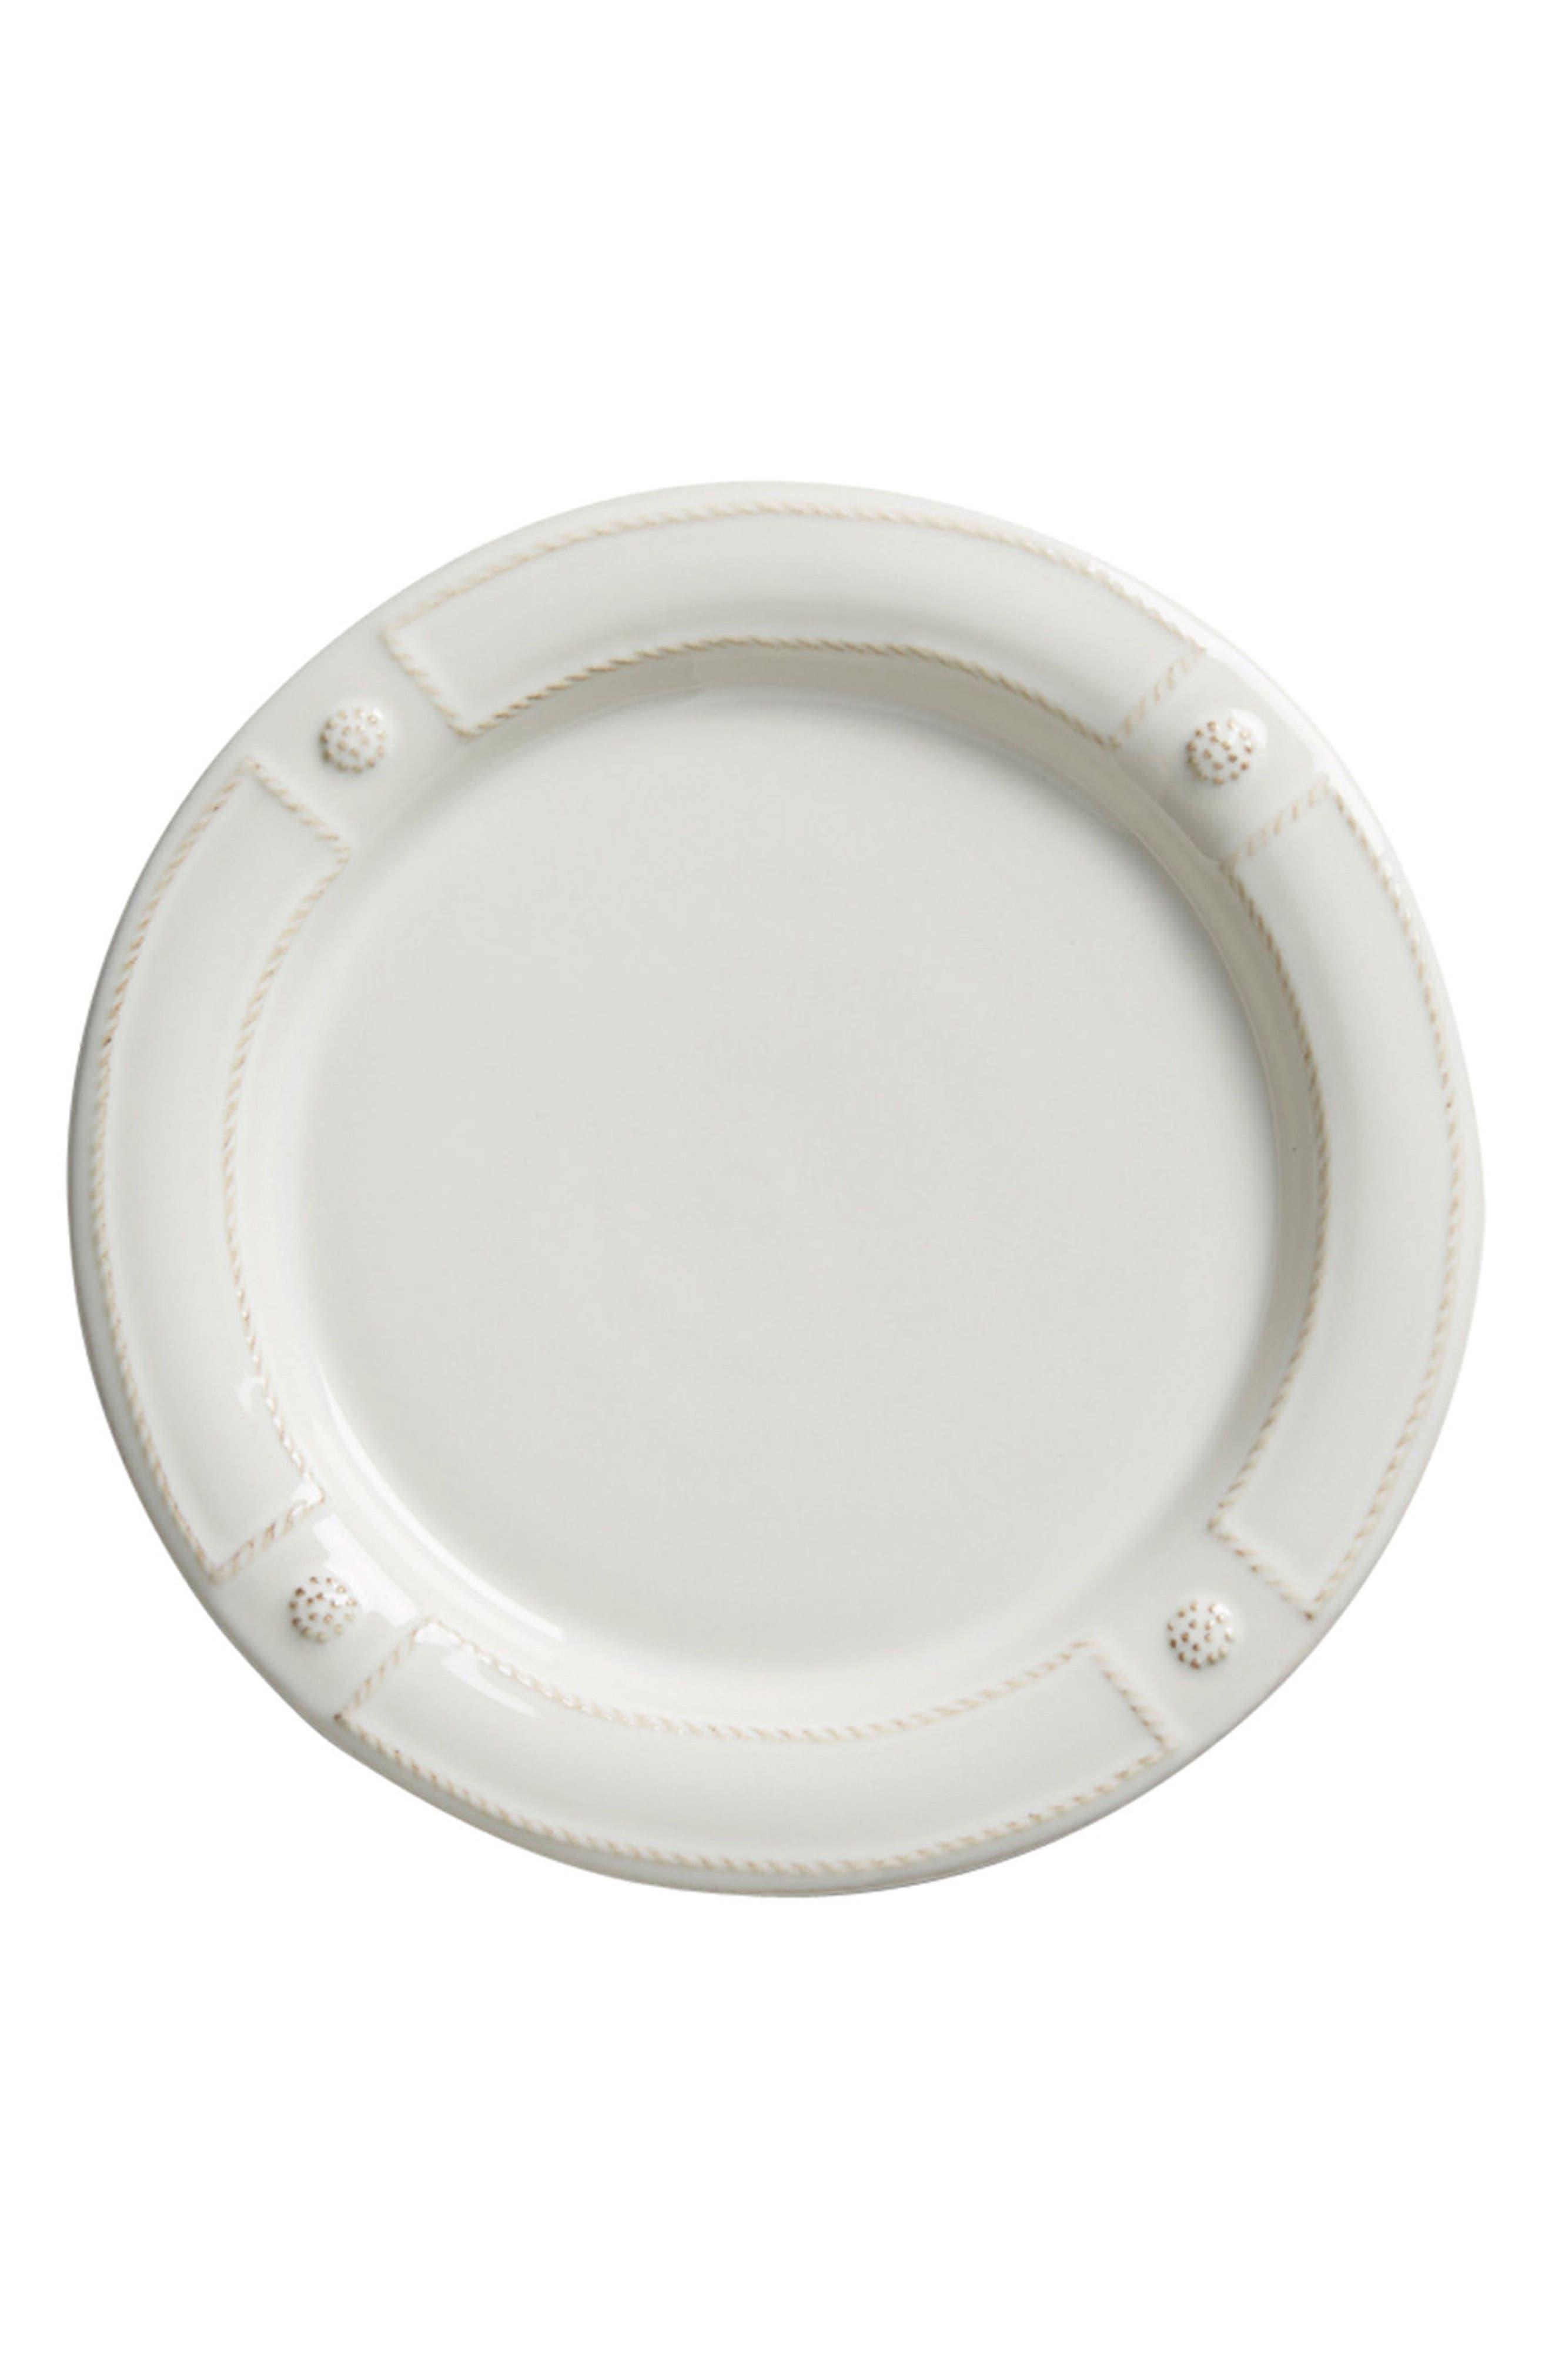 Main Image - Juliska Berry & Thread French Panel Ceramic Salad Plate